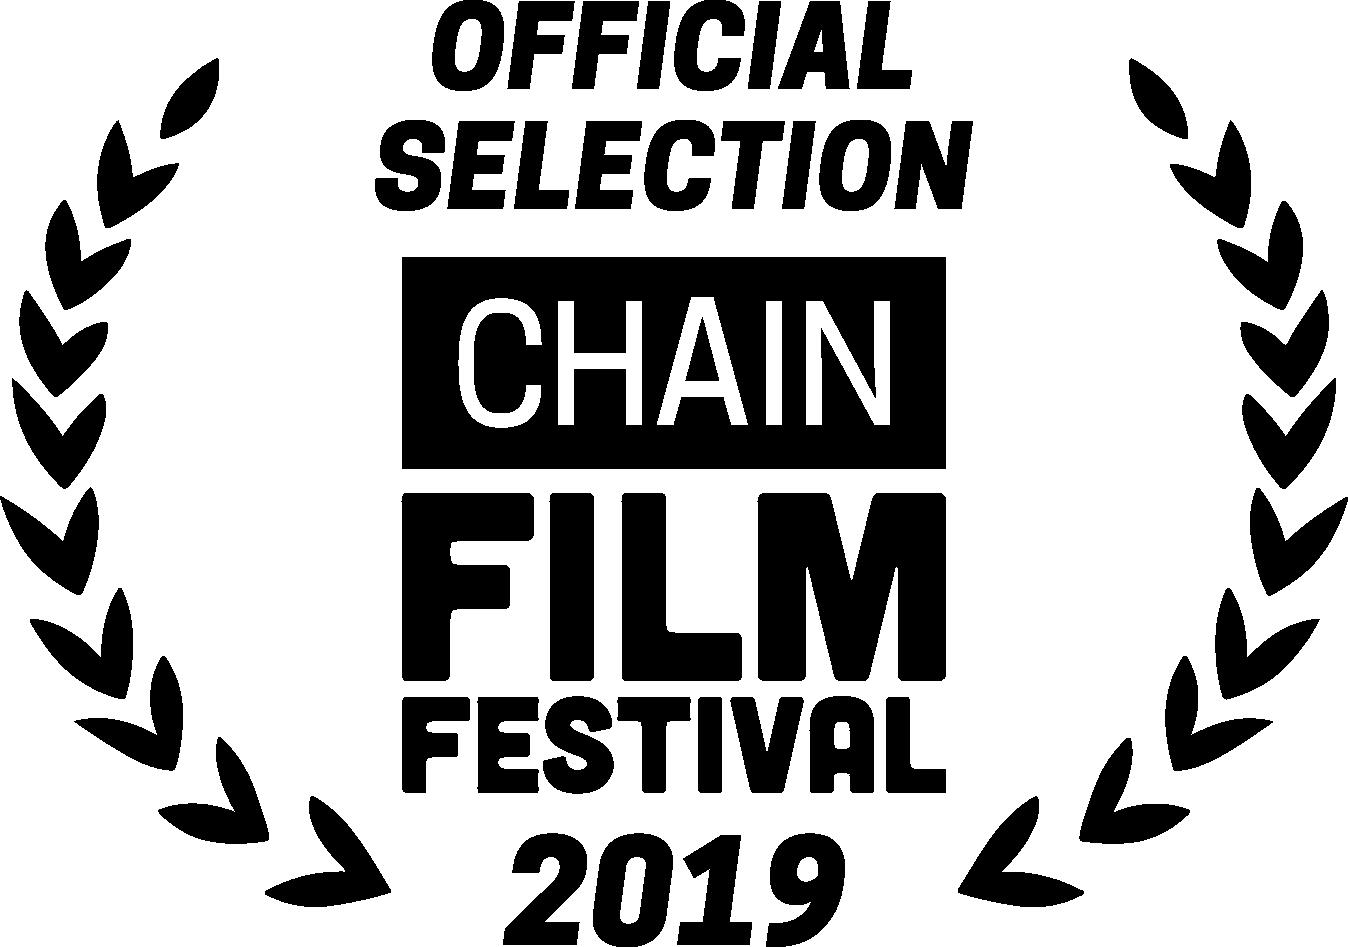 CFF-2019-laurel-black.png